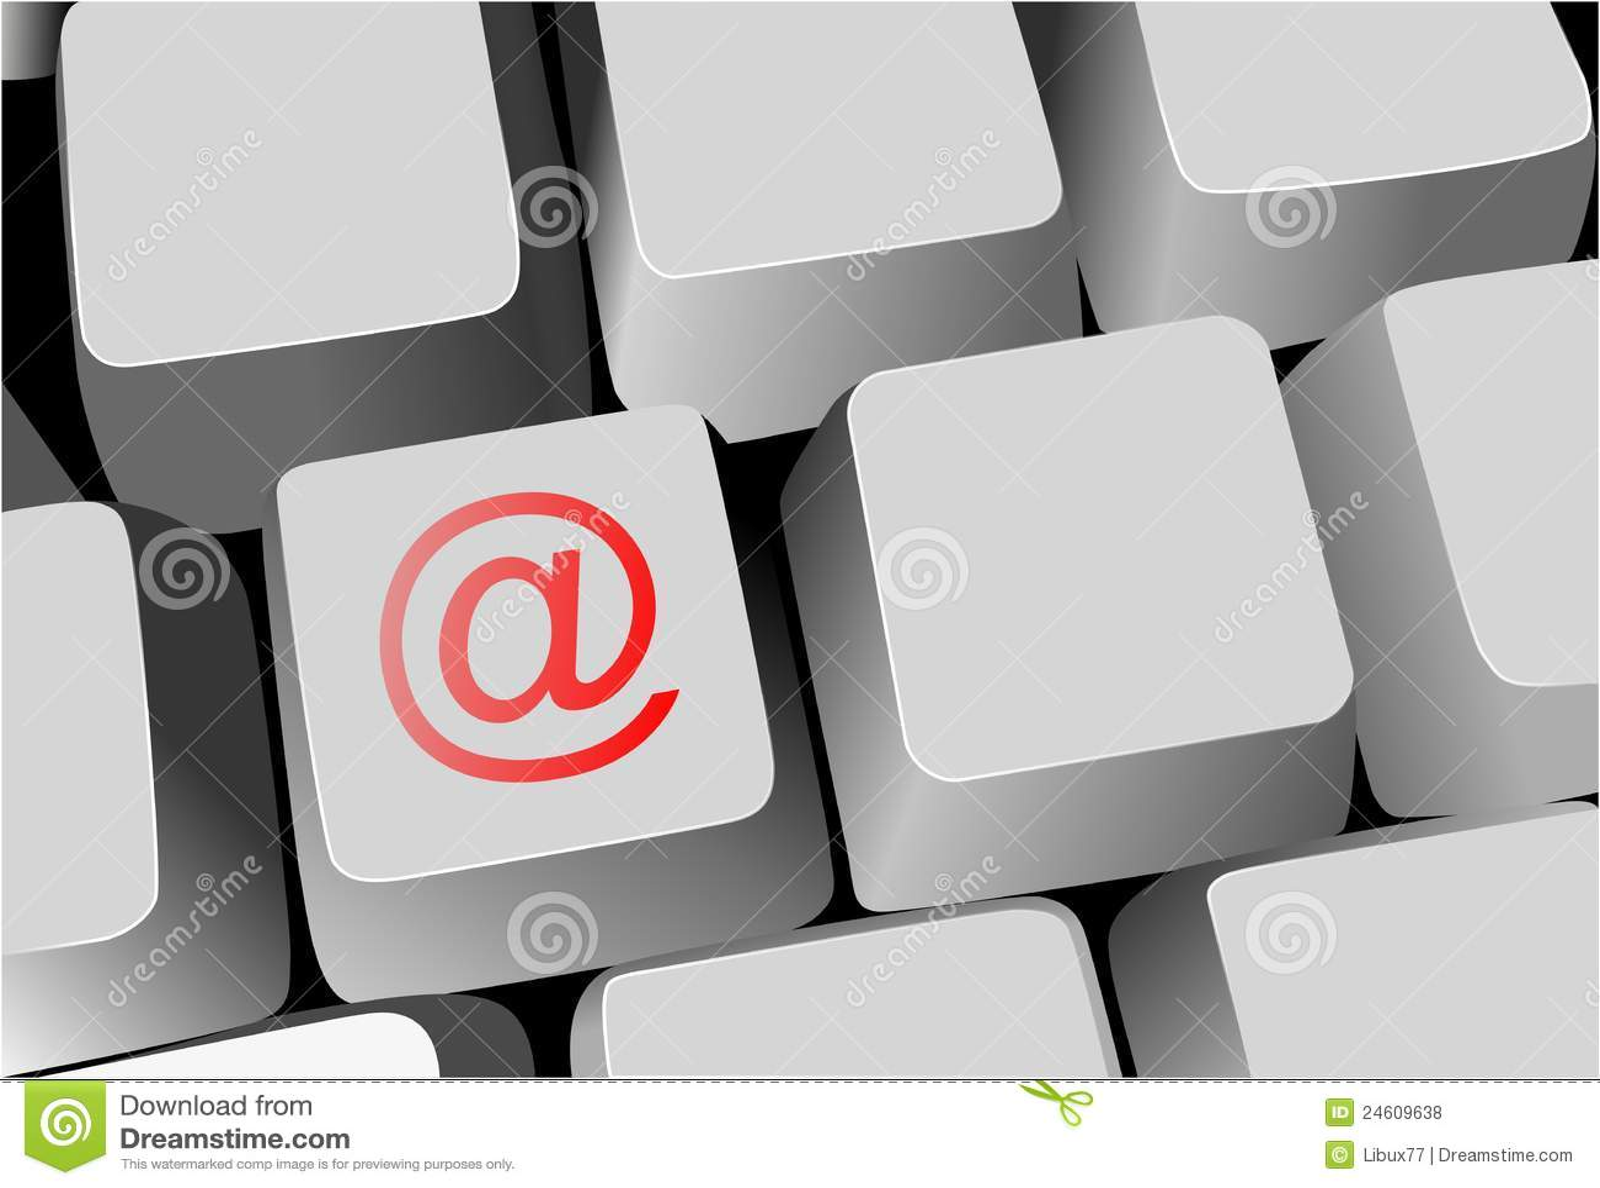 Keyboard key with email sign stock illustration illustration of royalty free stock photo buycottarizona Image collections